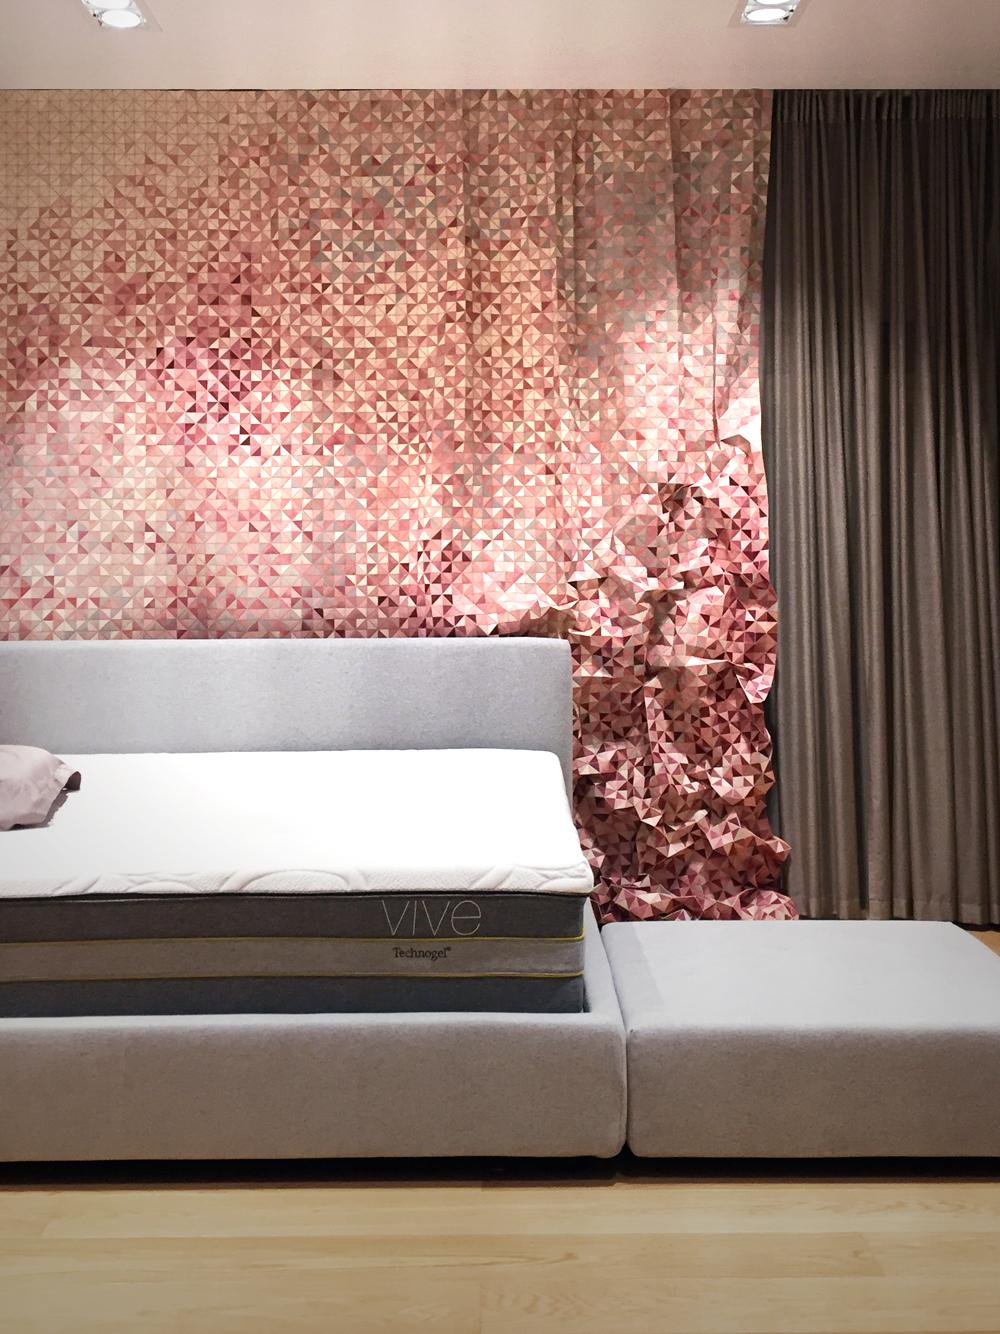 Technogel-Showroom-by-Coordination-Wooden-Curtain02.jpg